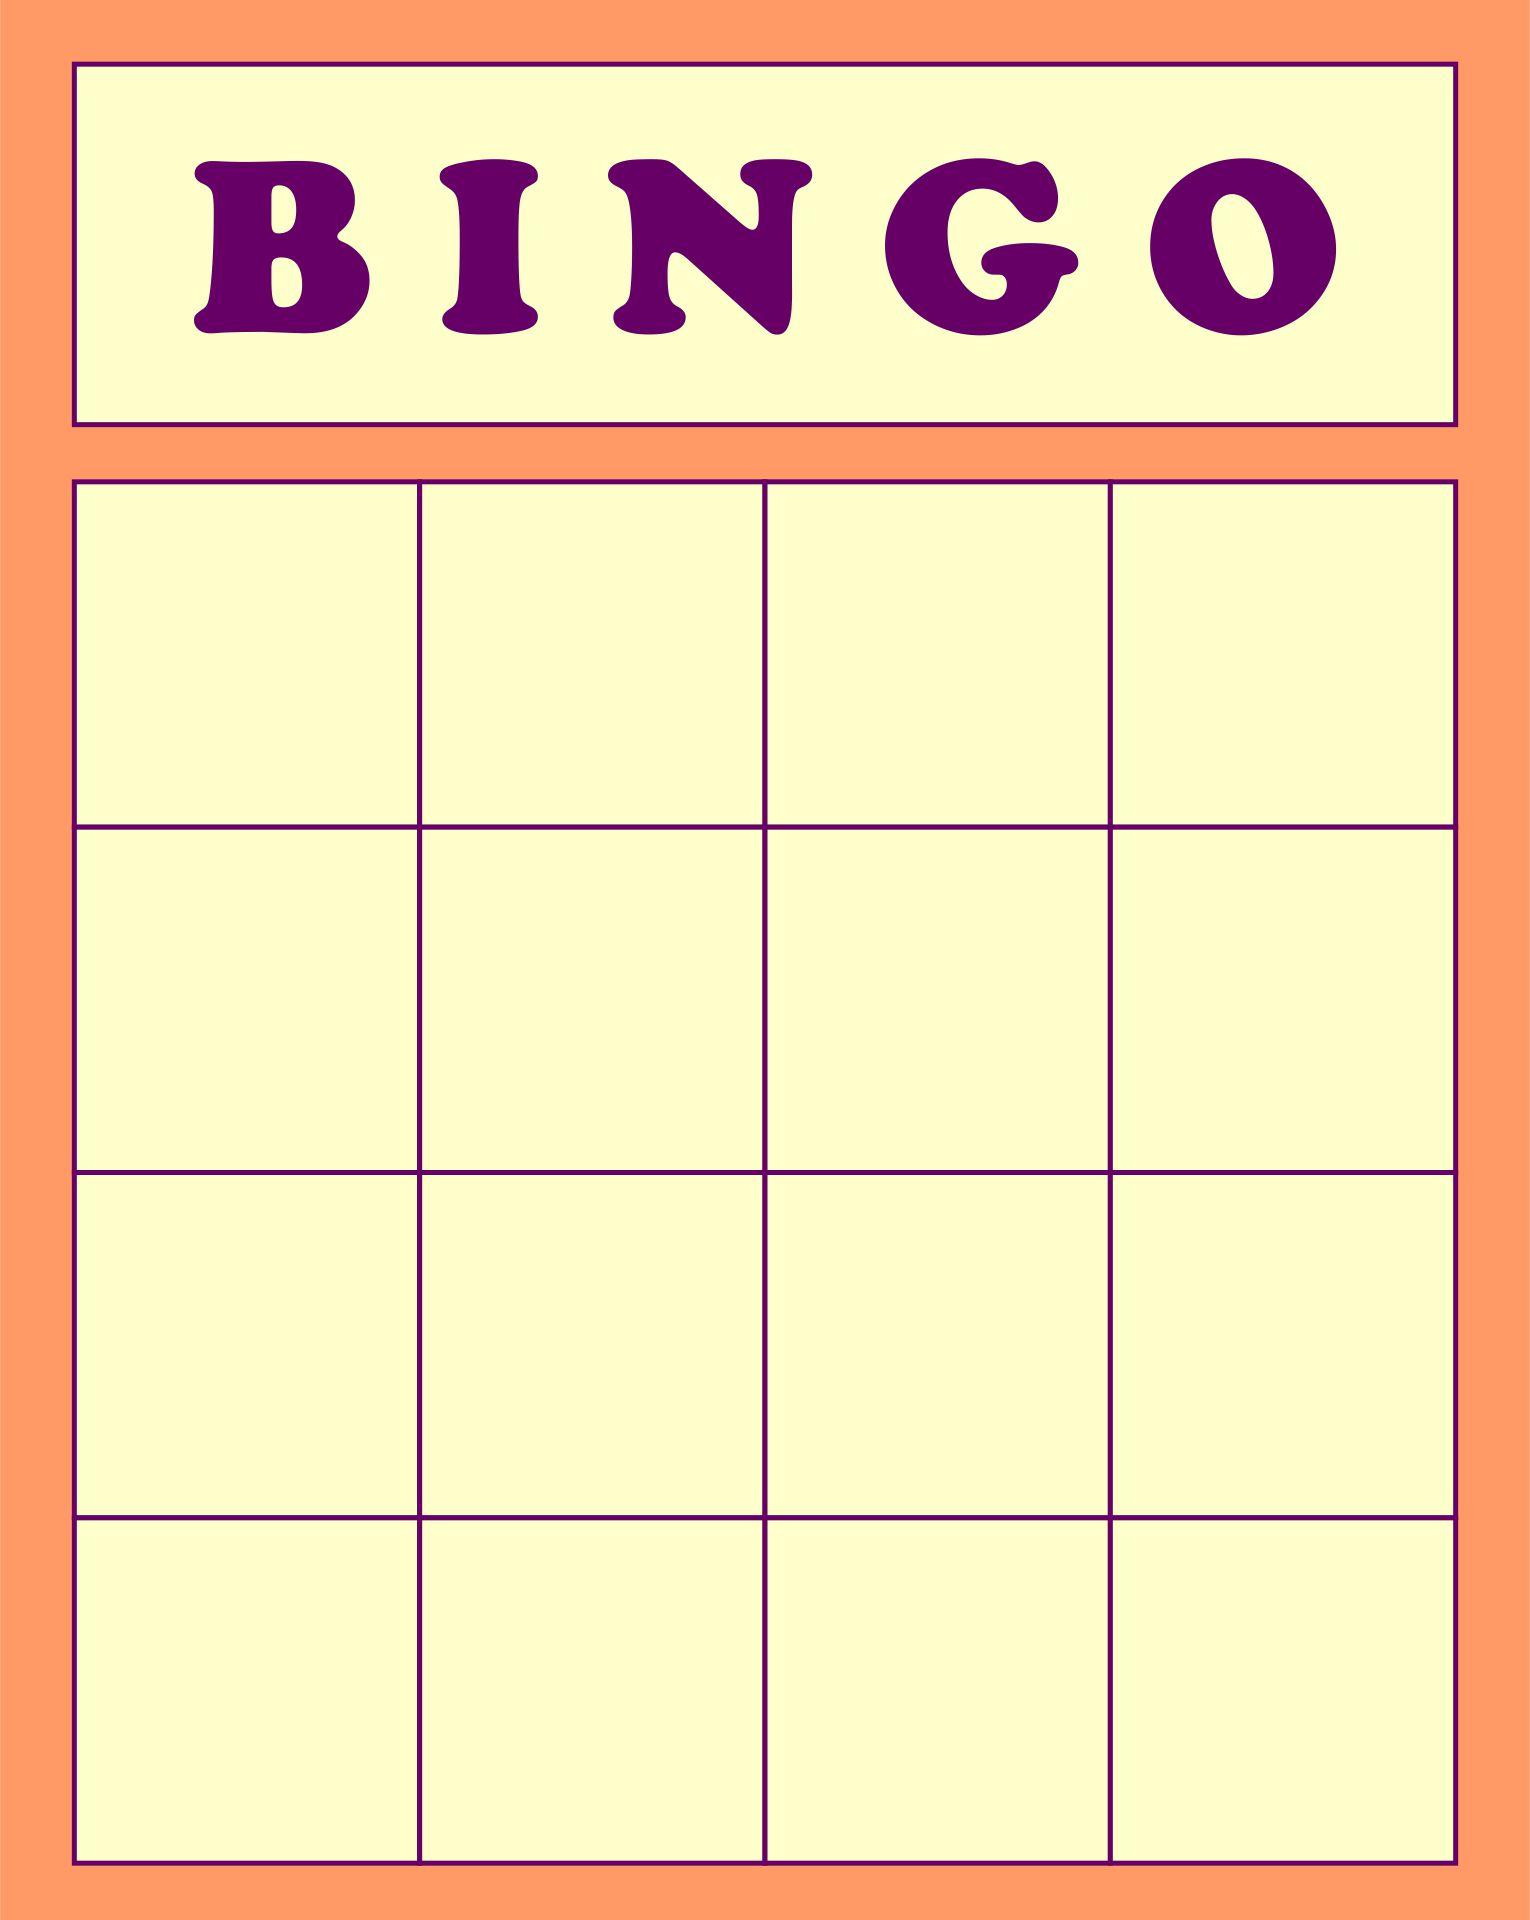 9 Best Images Of Printable Human Bingo Templates